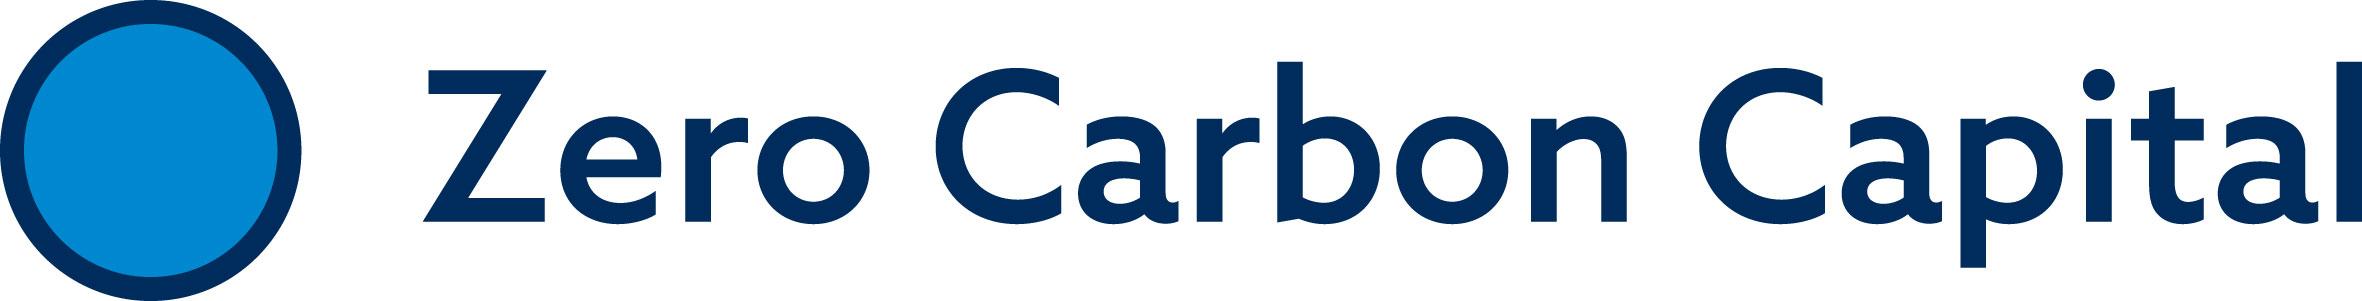 Zero-Carbon-Capital-Logo-Navy-text-RGB (3)